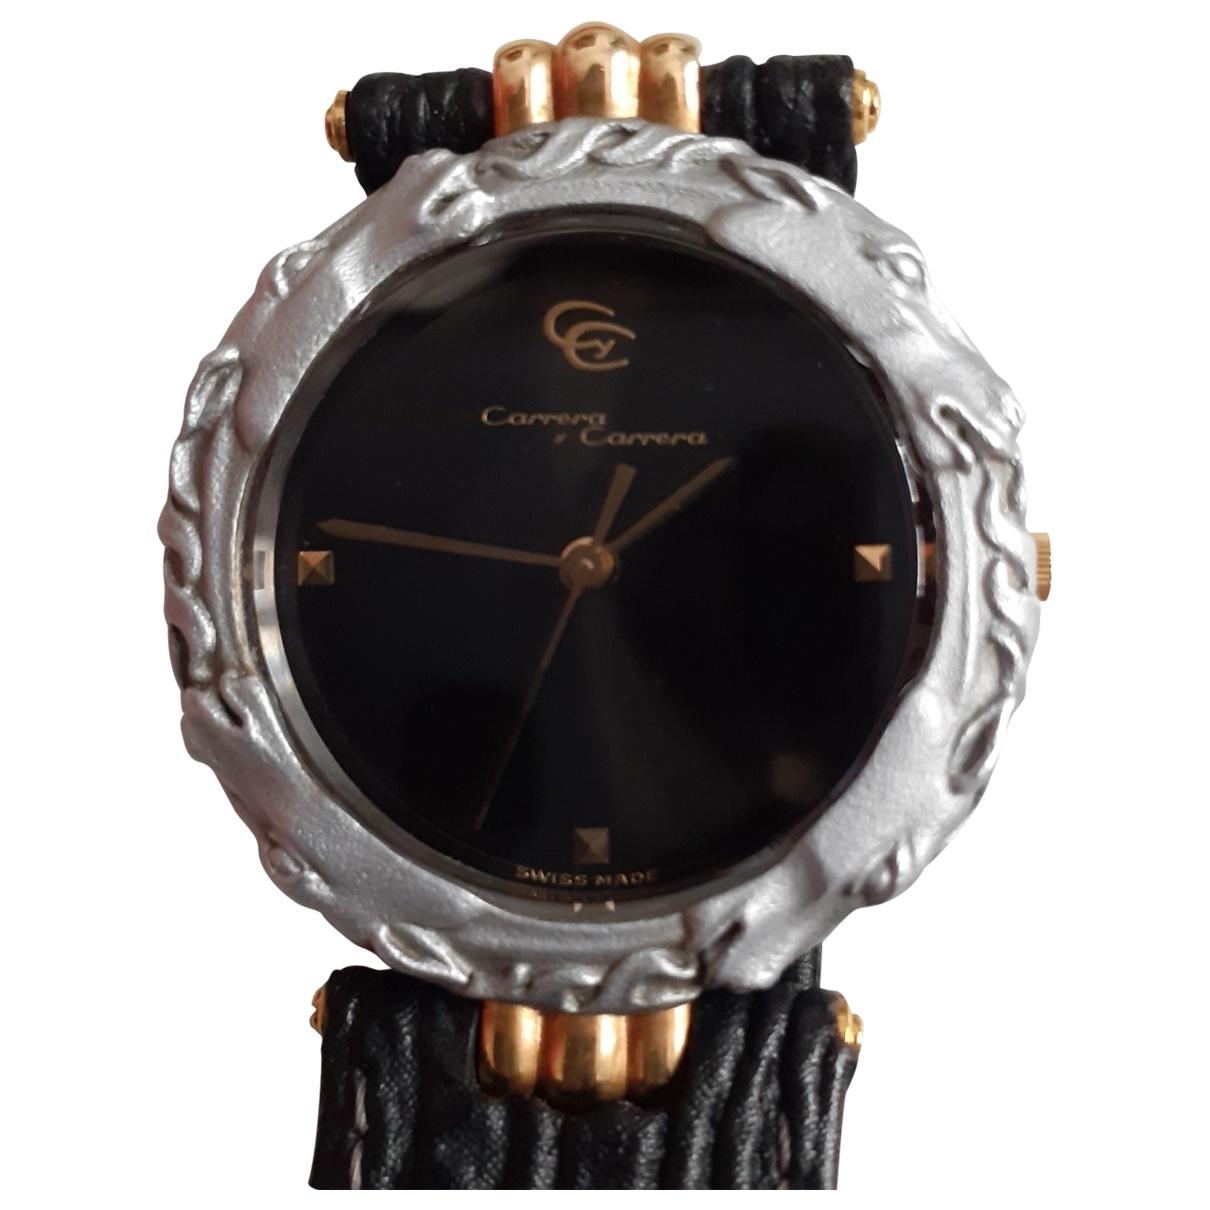 Reloj Carrera Y Carrera